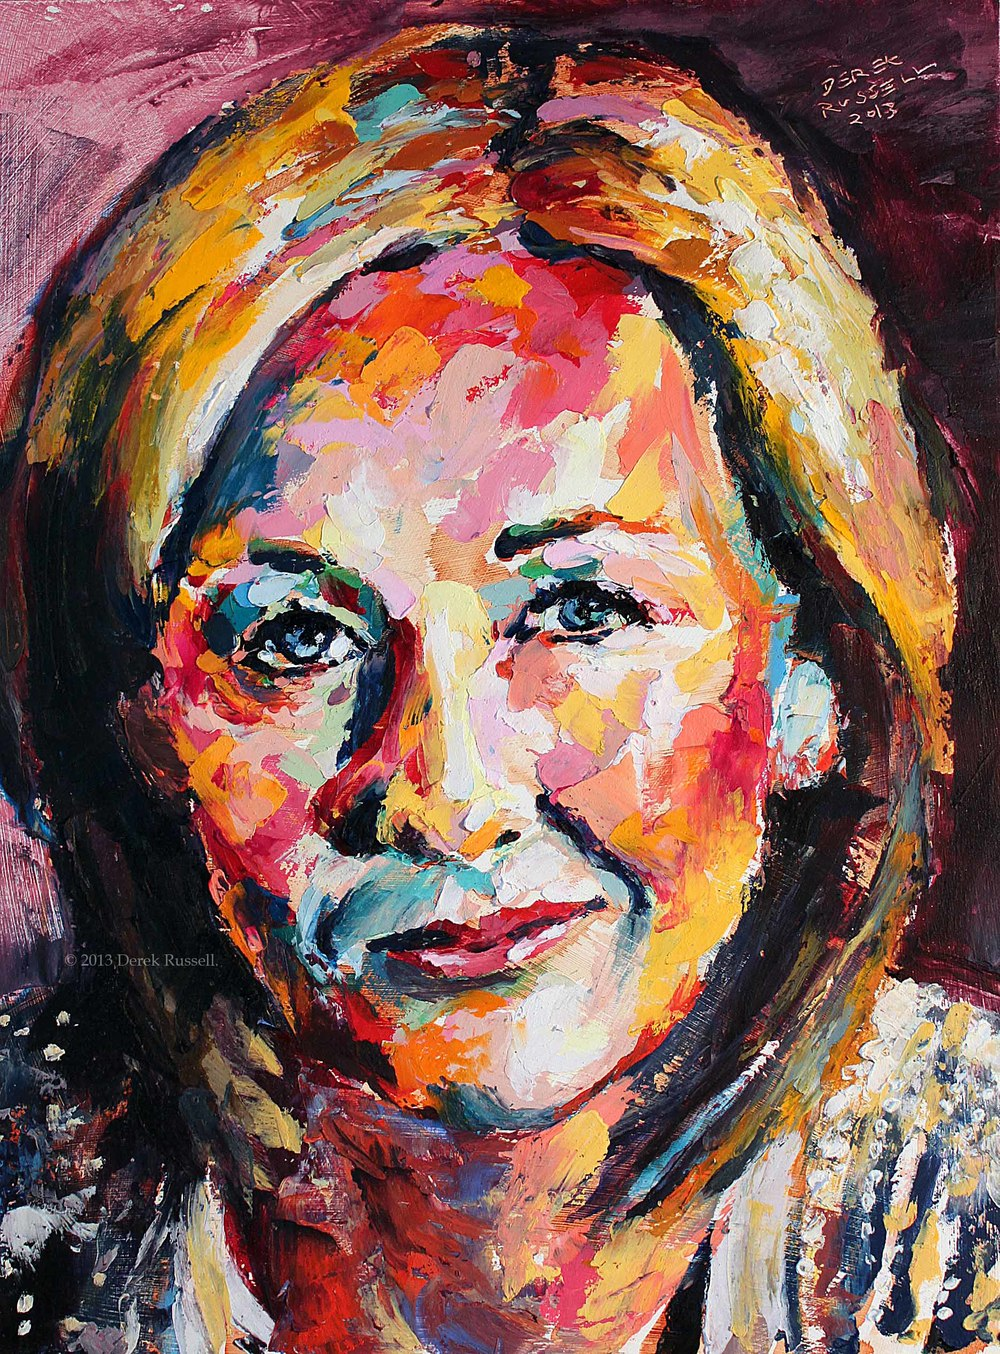 J.K. Rowling Original Fine Art Oil Painting by Artist Derek Russell